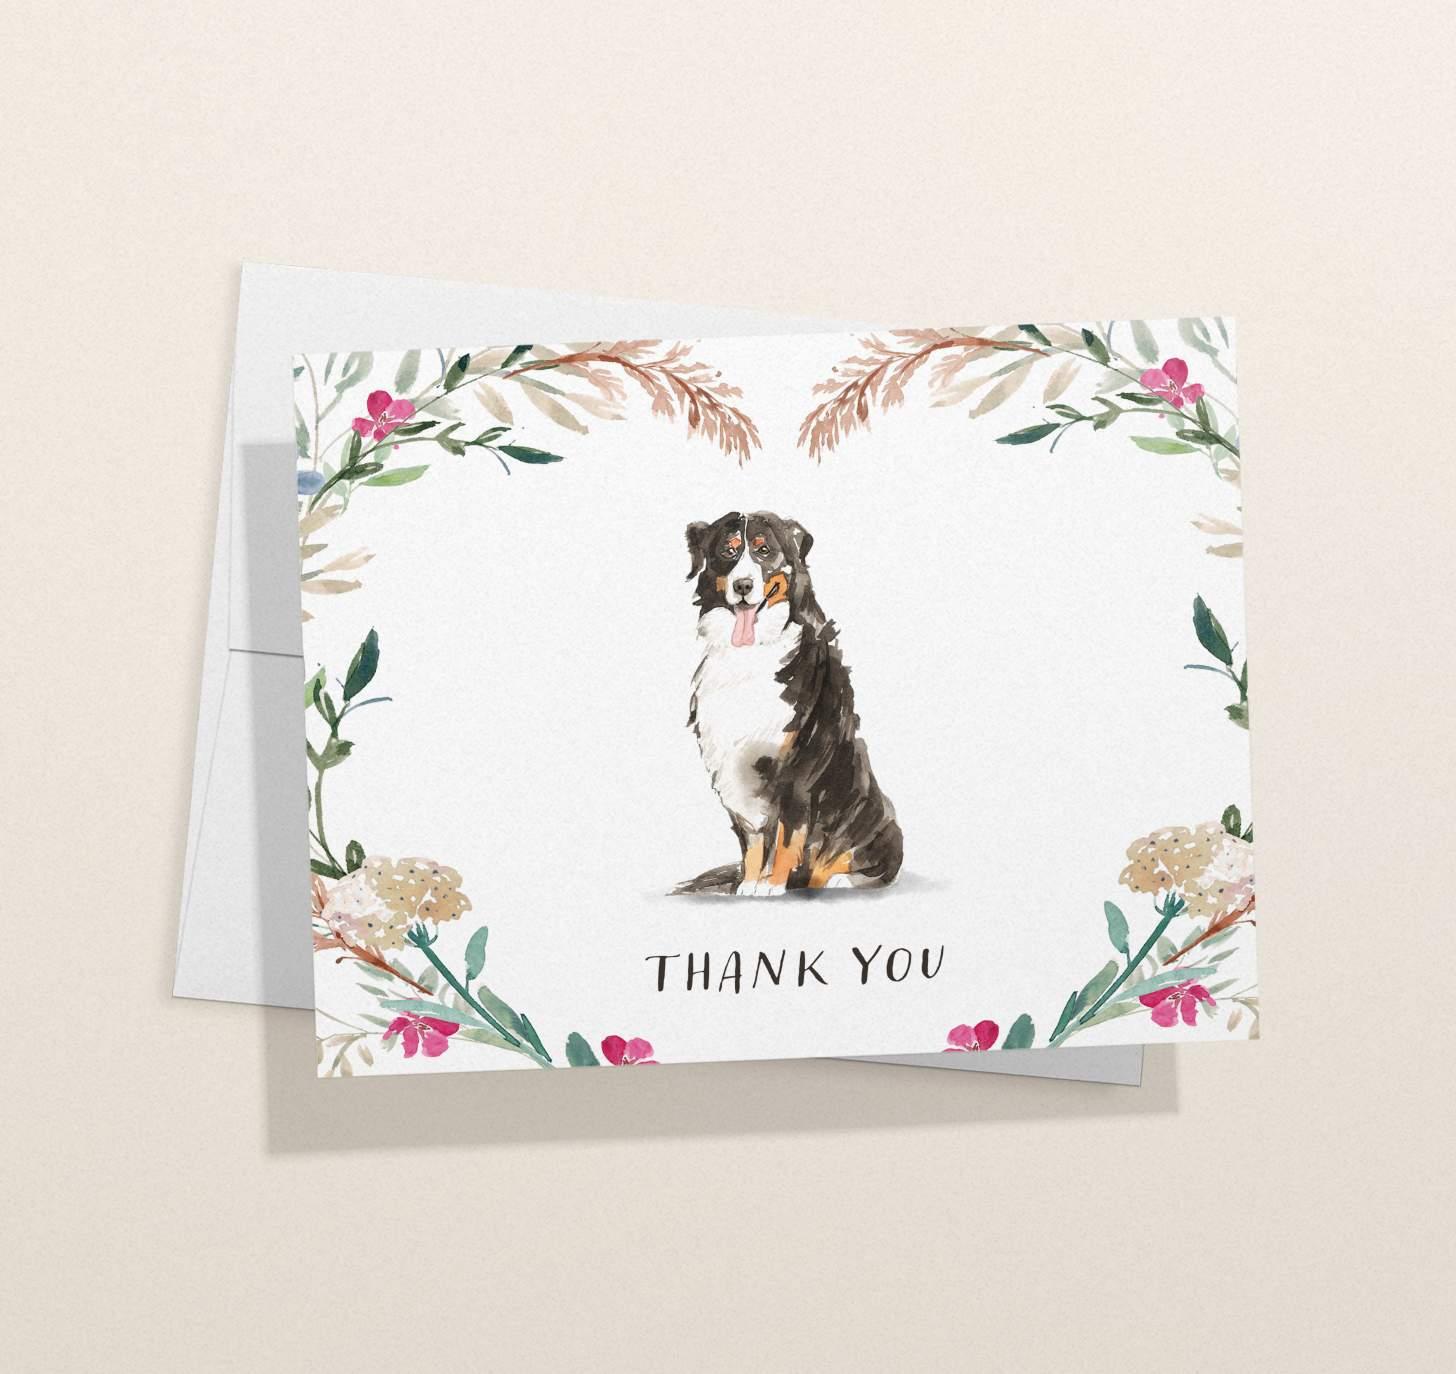 Bernese mountain dog design card with envelope